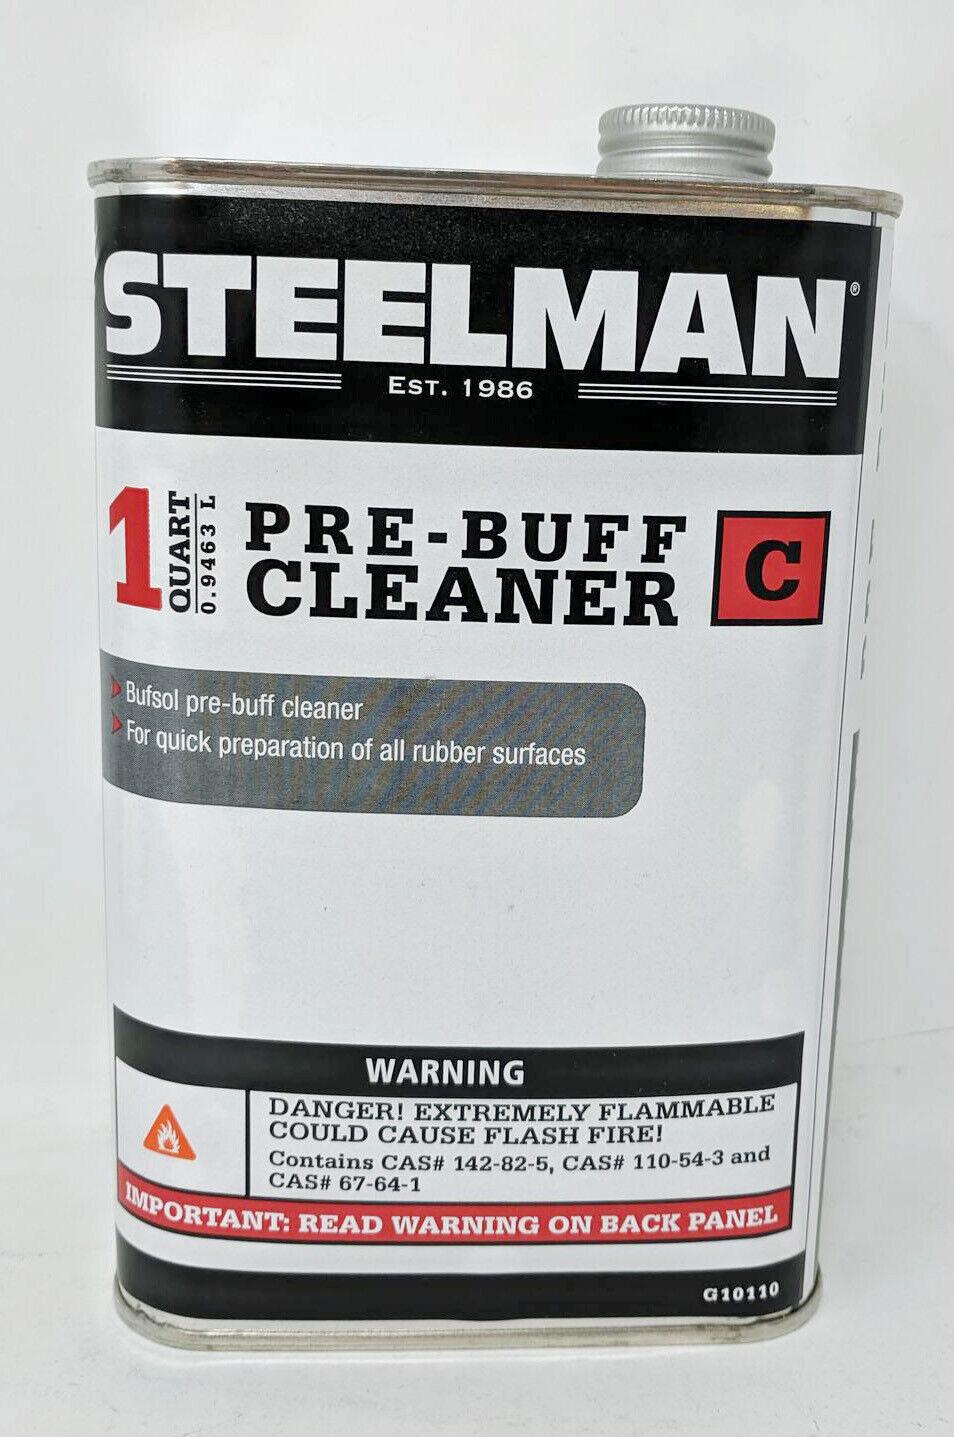 STEELMAN G10110 Bufsol Pre-Buff Cleaner - 1 Quart